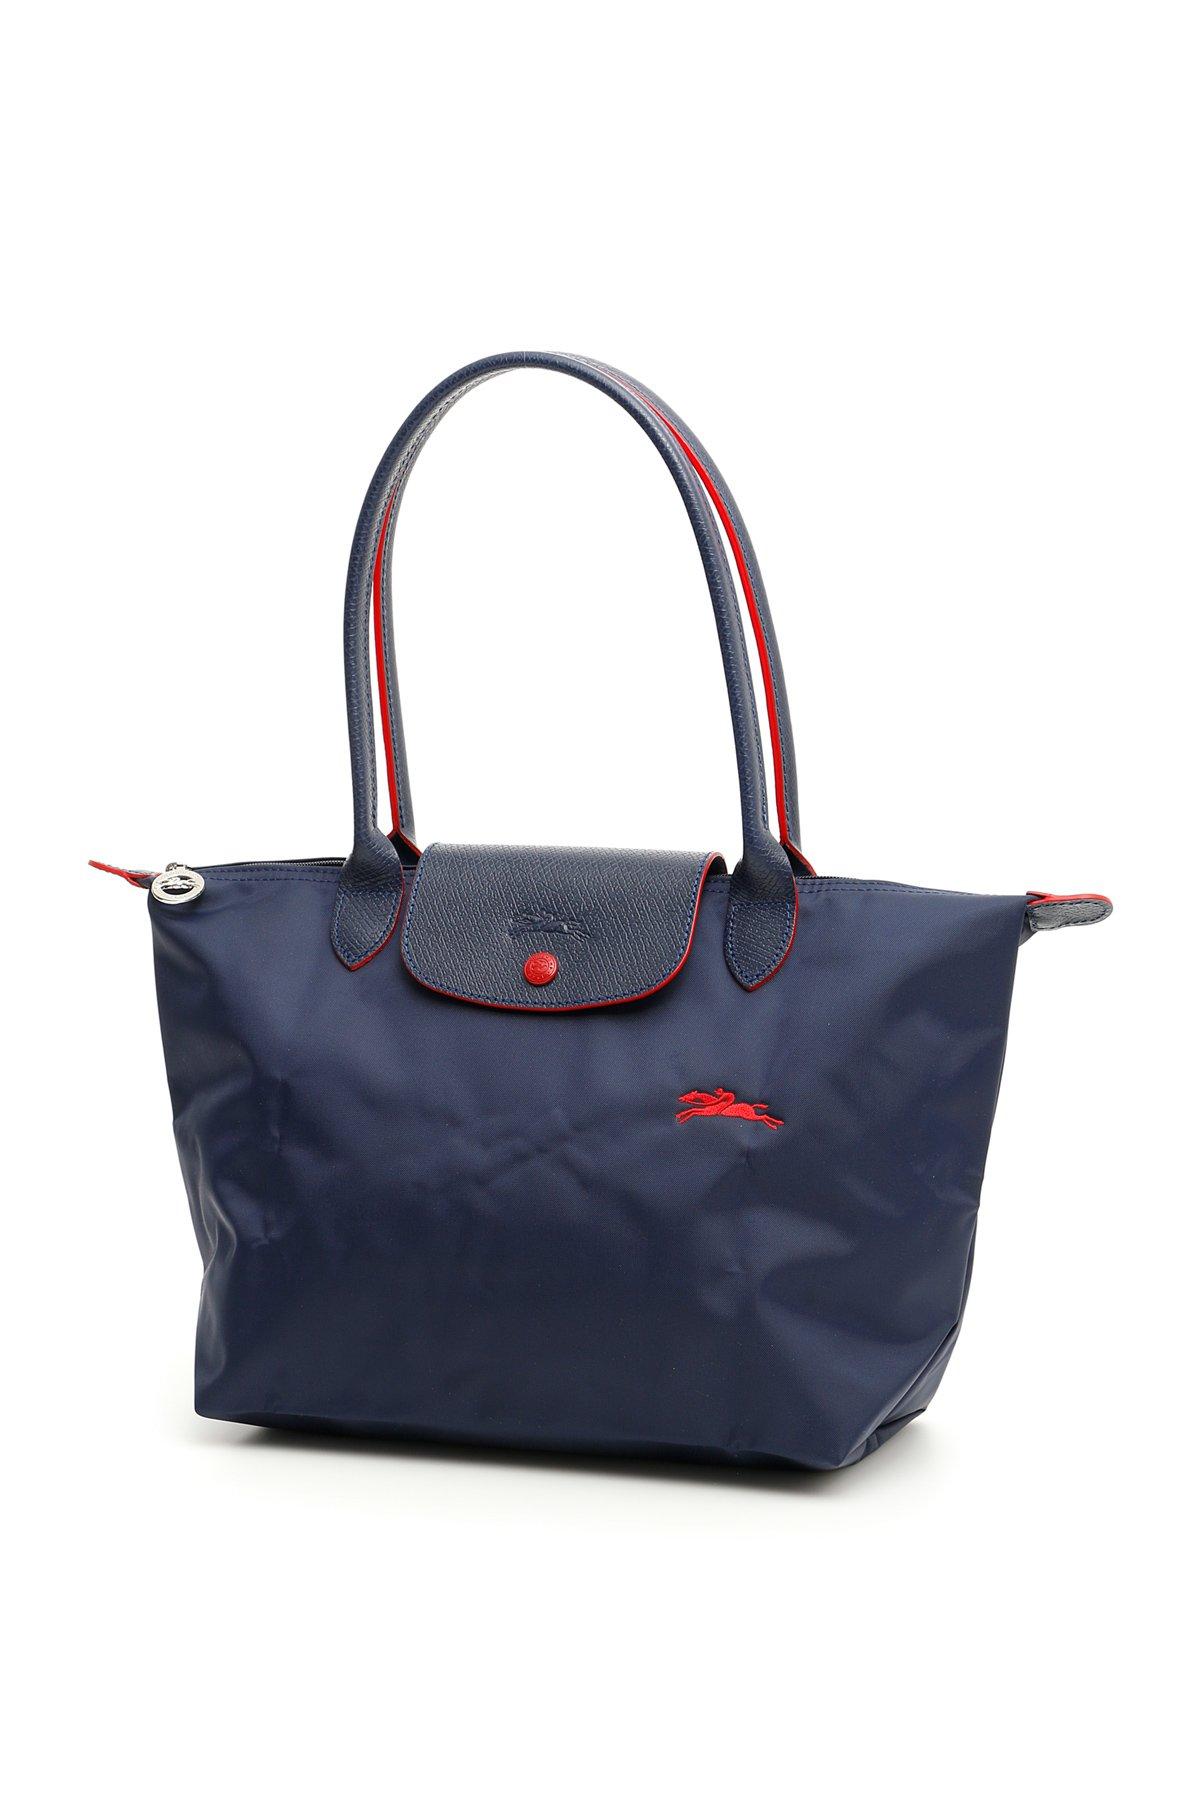 Longchamp shopping le pliage club